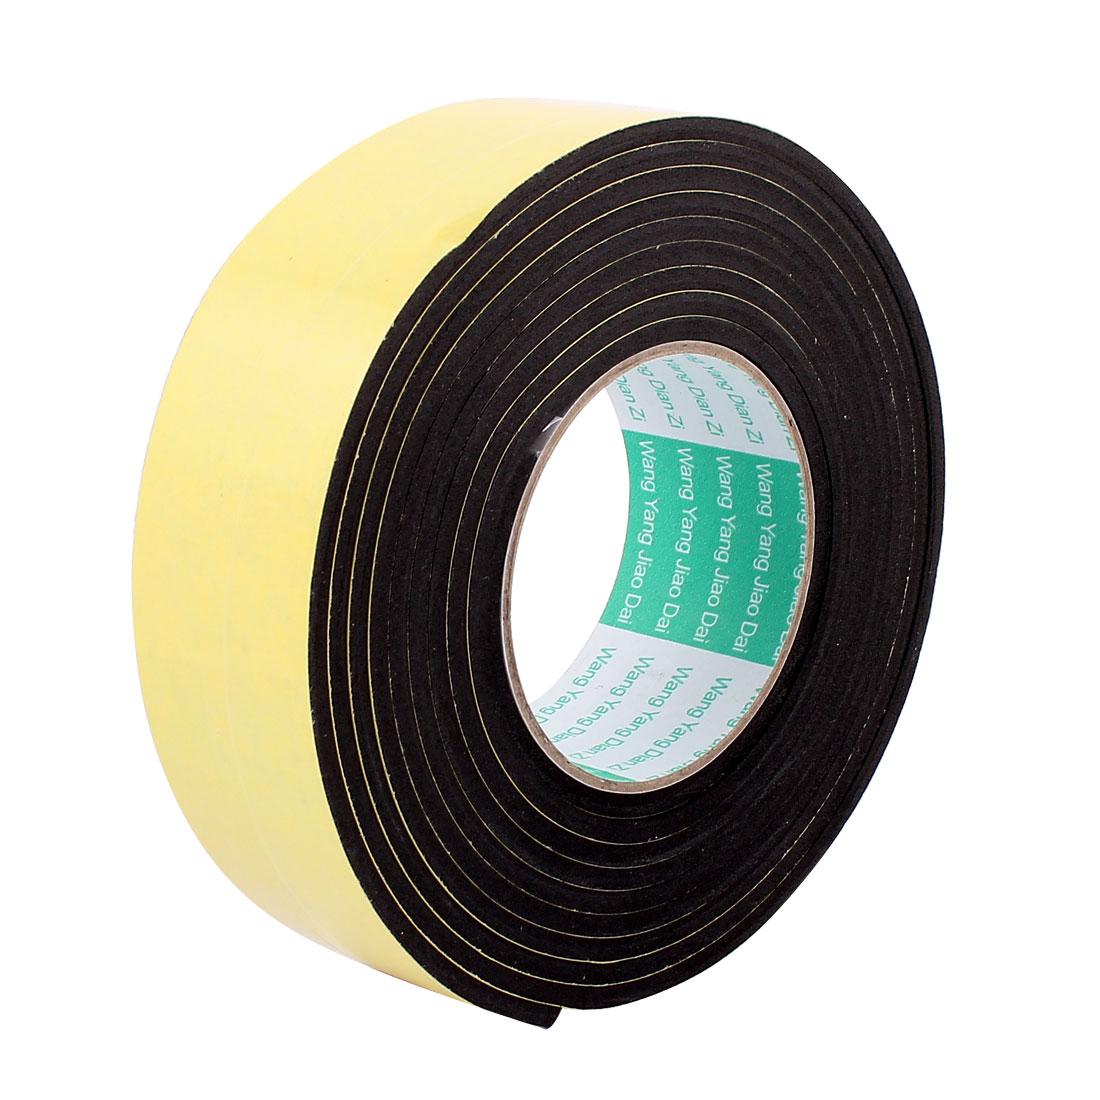 45mmx4mm Single Sided Sponge Tape Adhesive Sticker Foam Glue Strip Sealing 3 Meters 10Ft